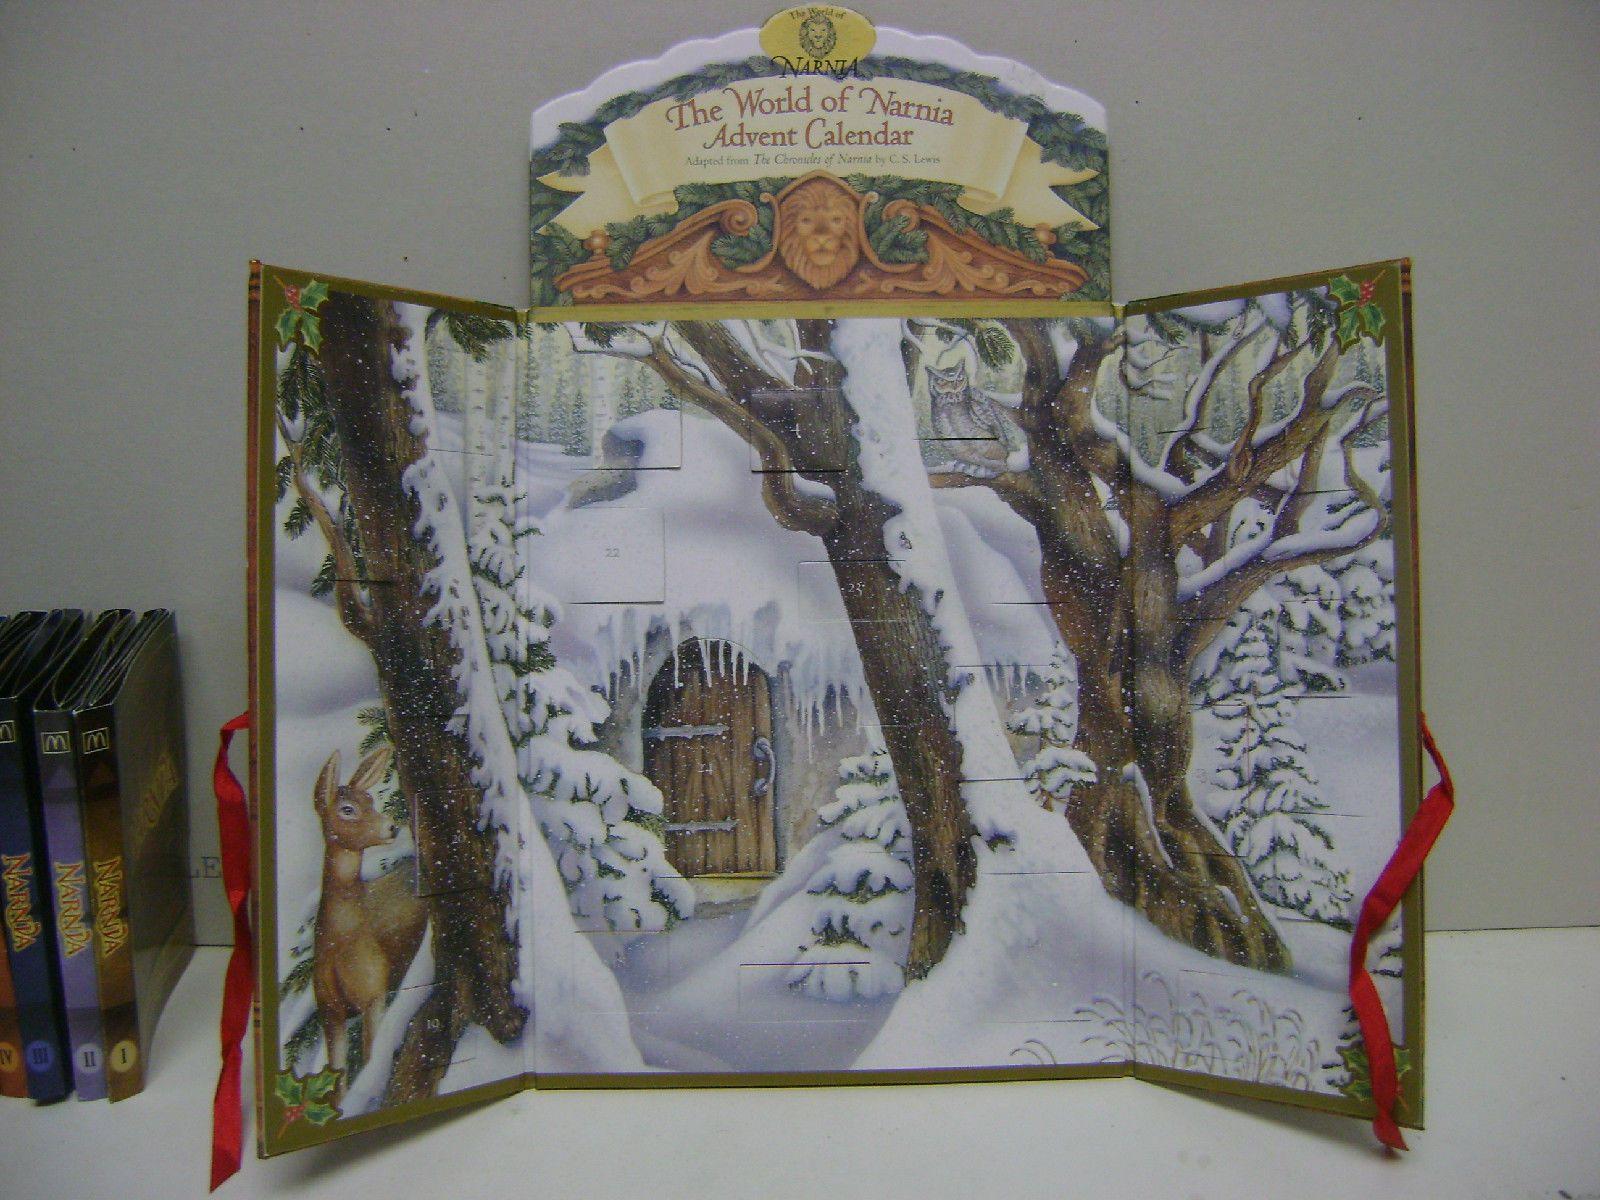 The World Of Narnia Advent Calendar 1998 Open